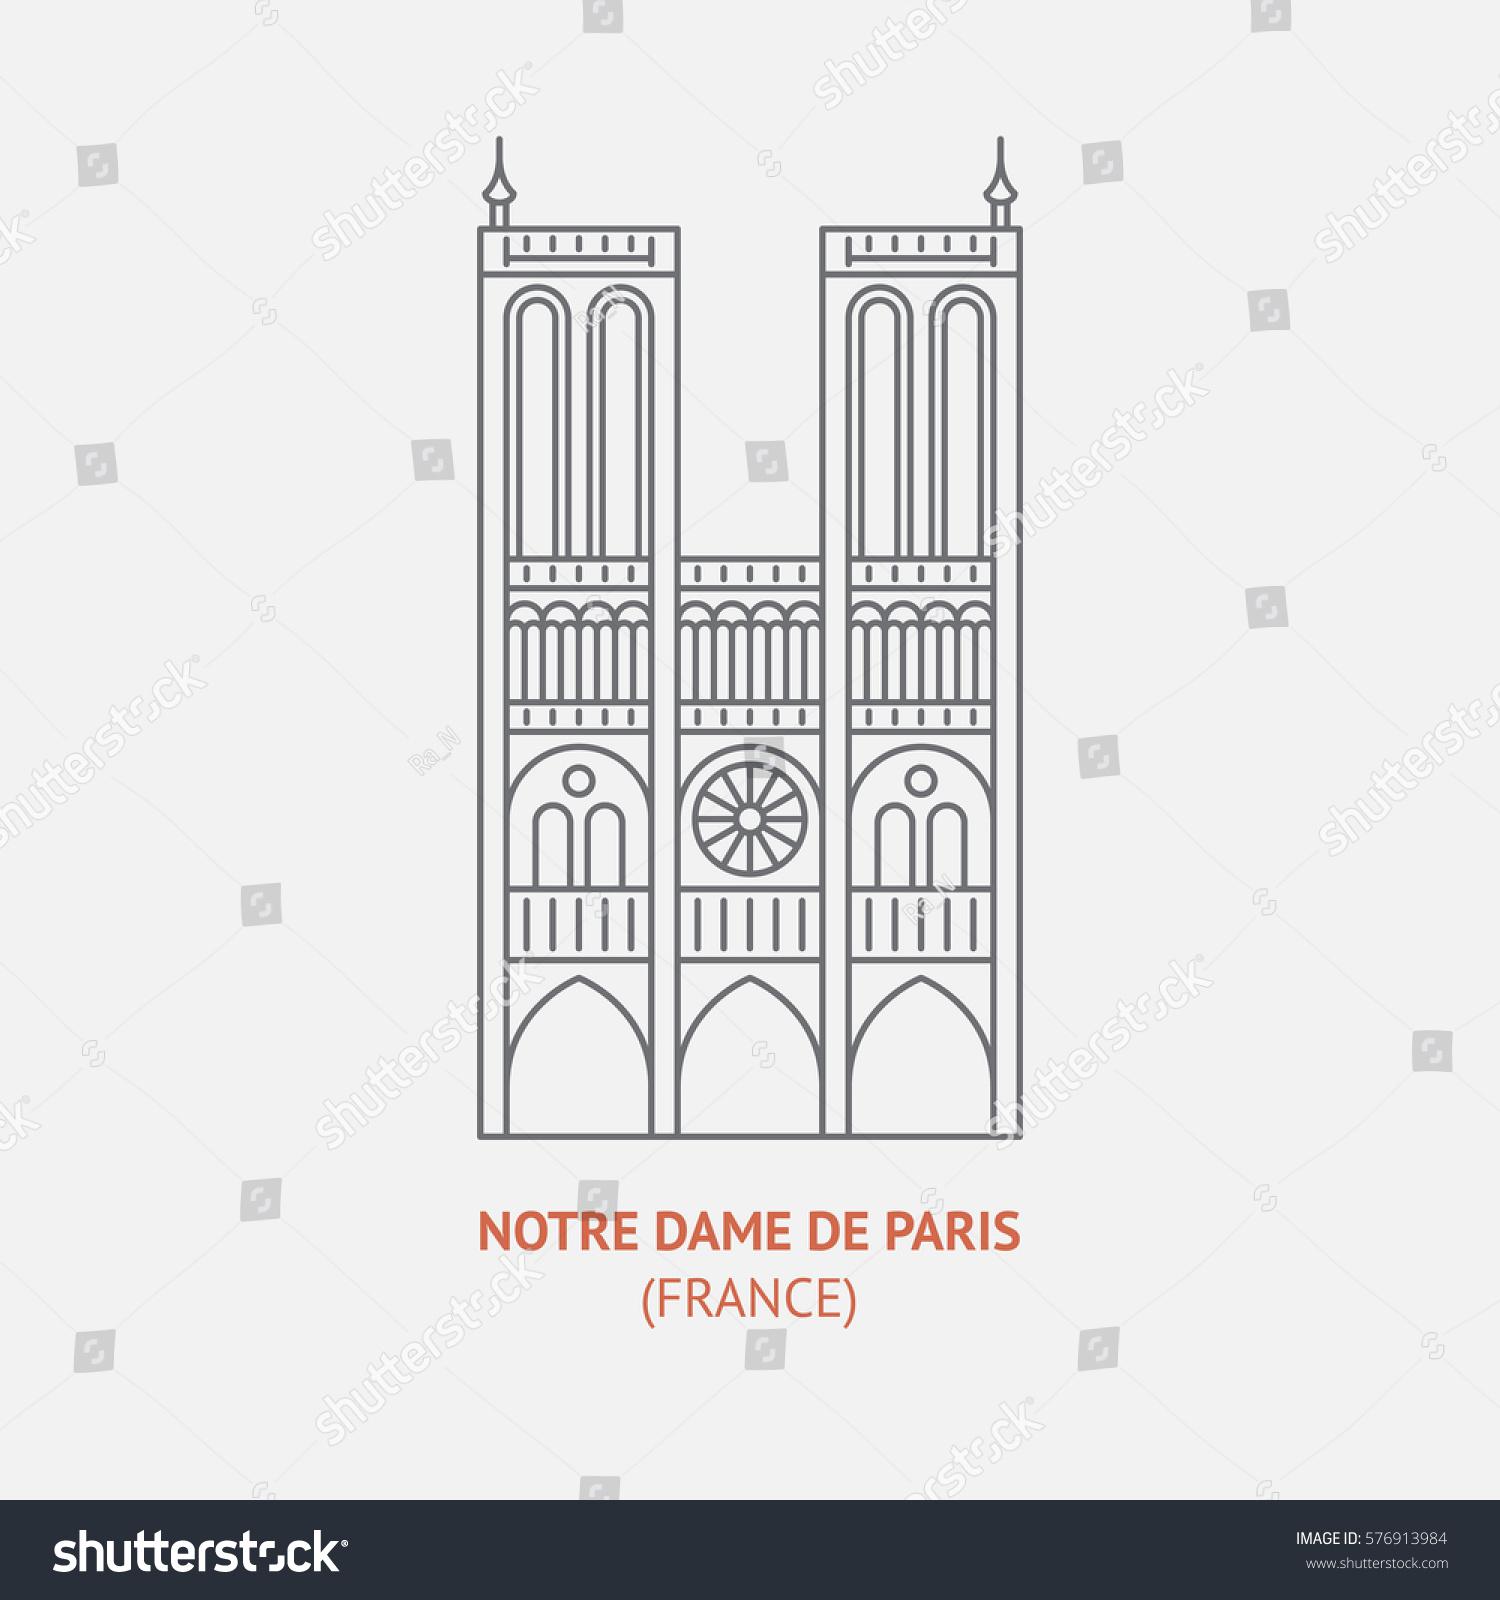 Notre Dame De Paris Disegno.Notre Dame De Paris Thin Vector Stock Vector Royalty Free 576913984